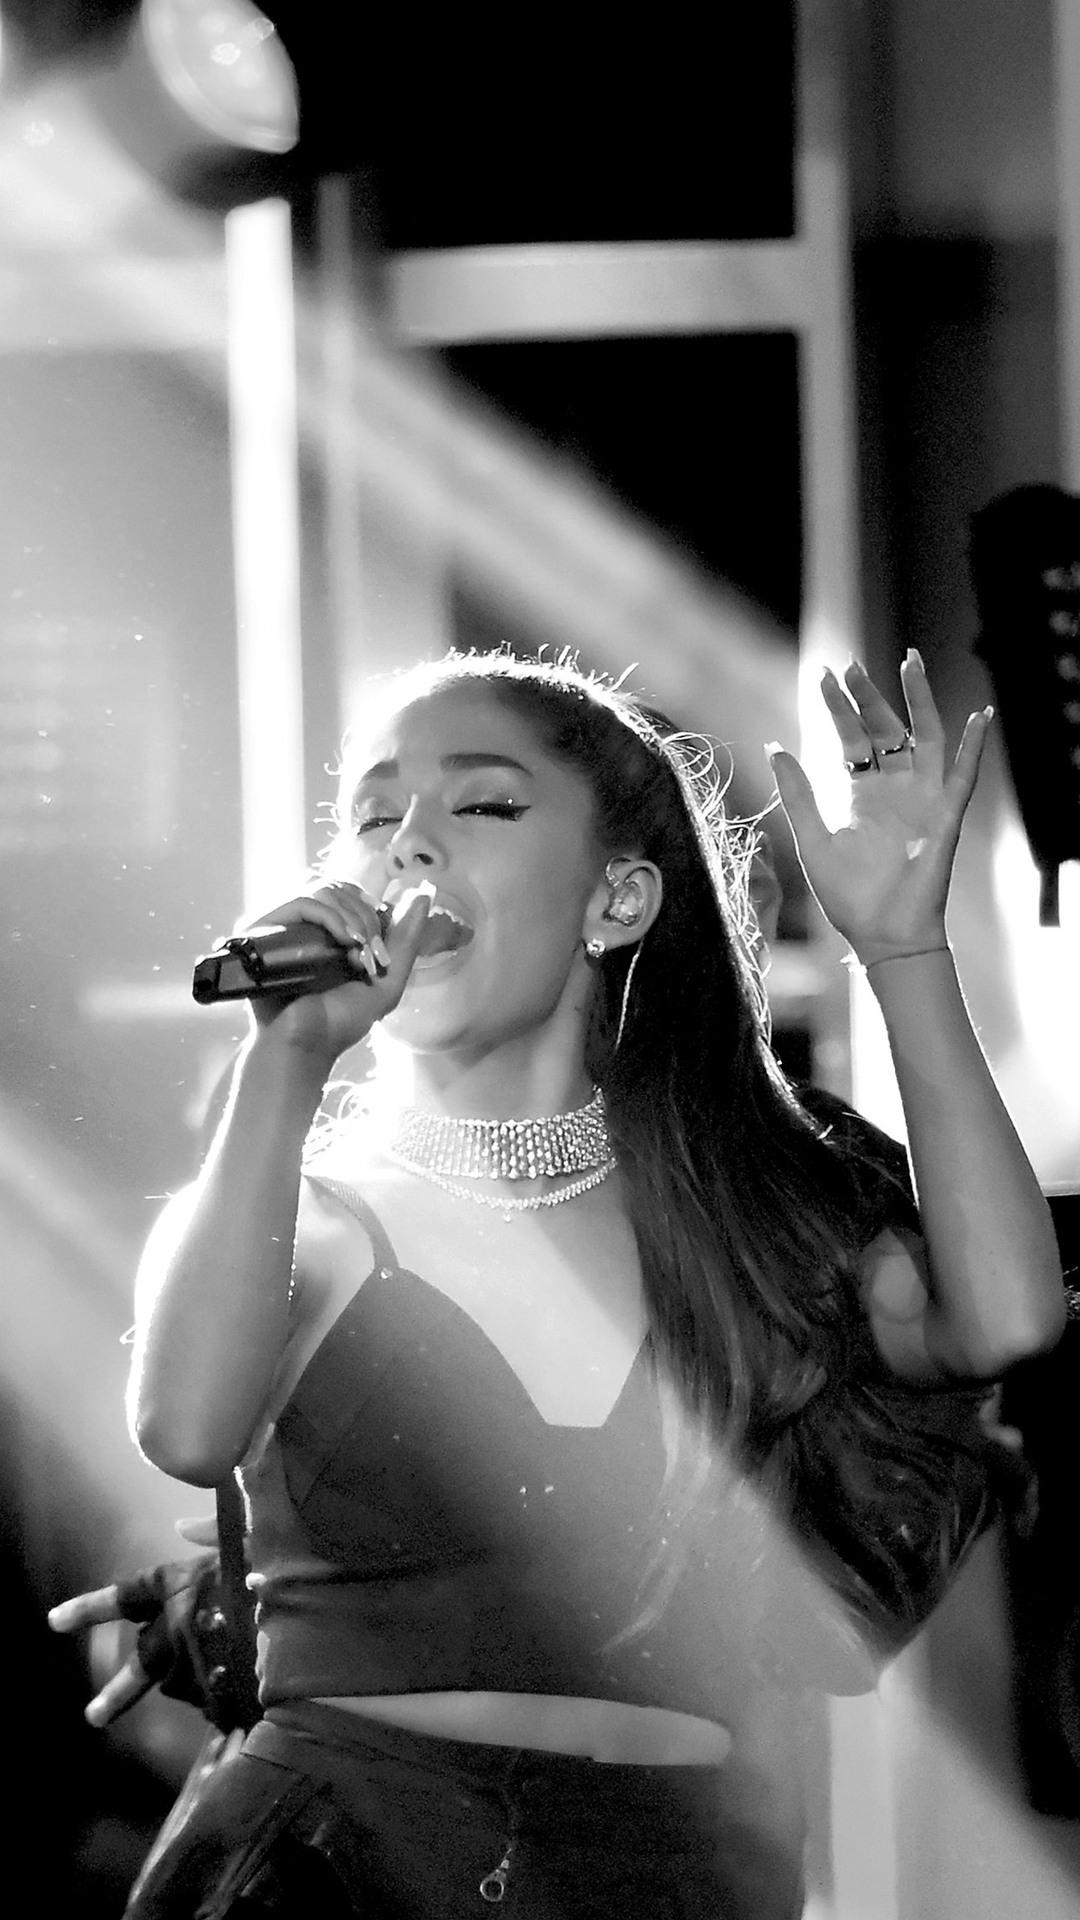 3d Iphone 7 Plus Wallpaper 1080x1920 Ariana Grande Life Performance Iphone 7 6s 6